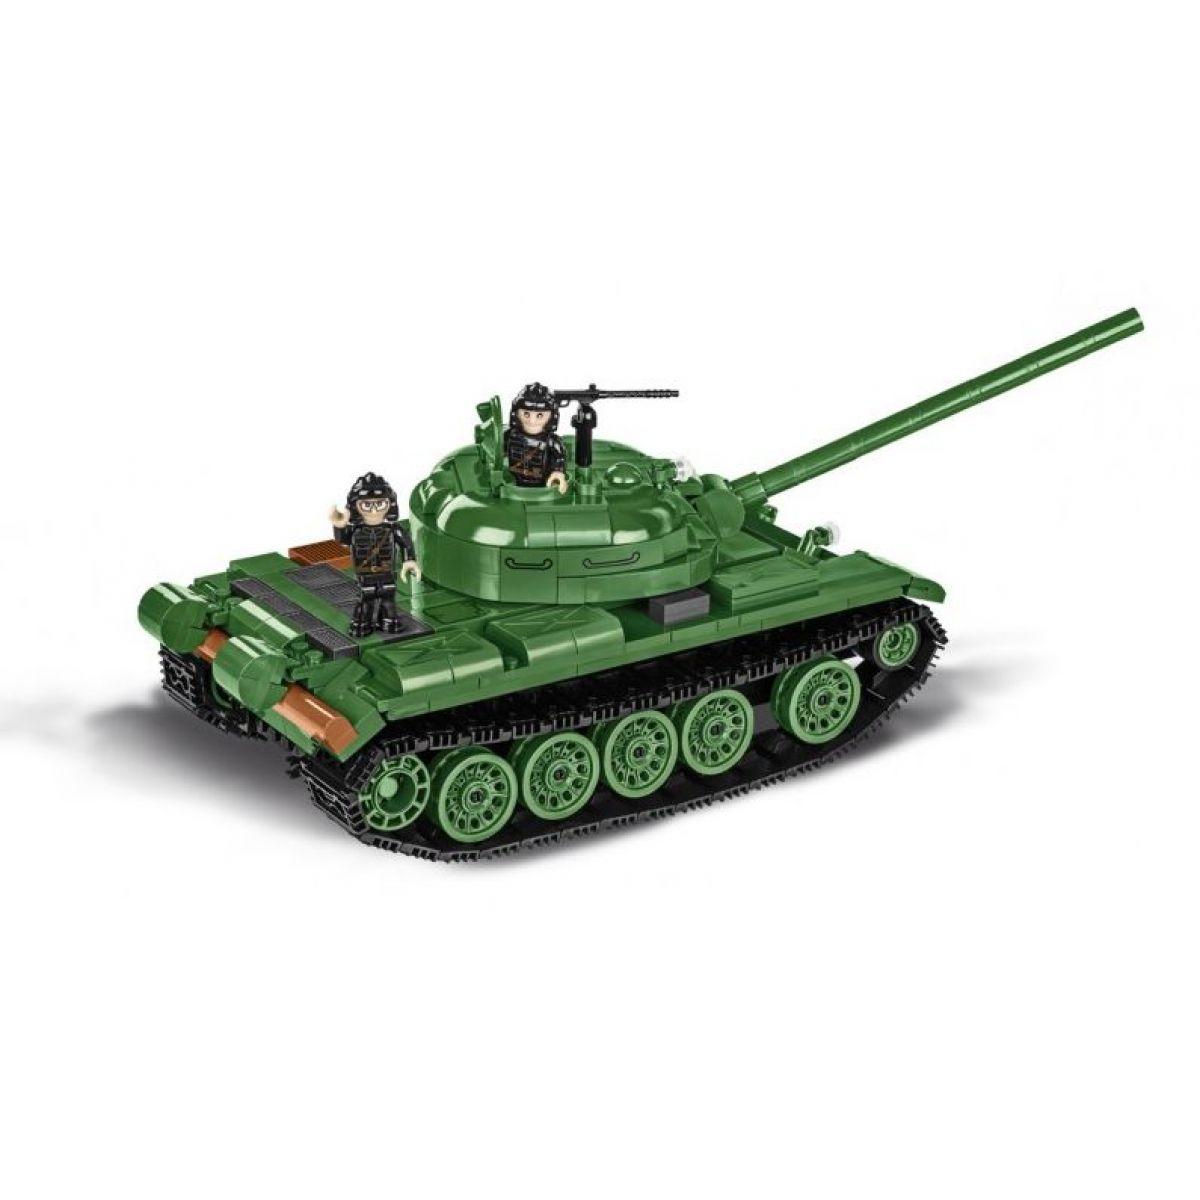 Cobi 2613 Malá armáda Tank T-54 - Poškozený obal